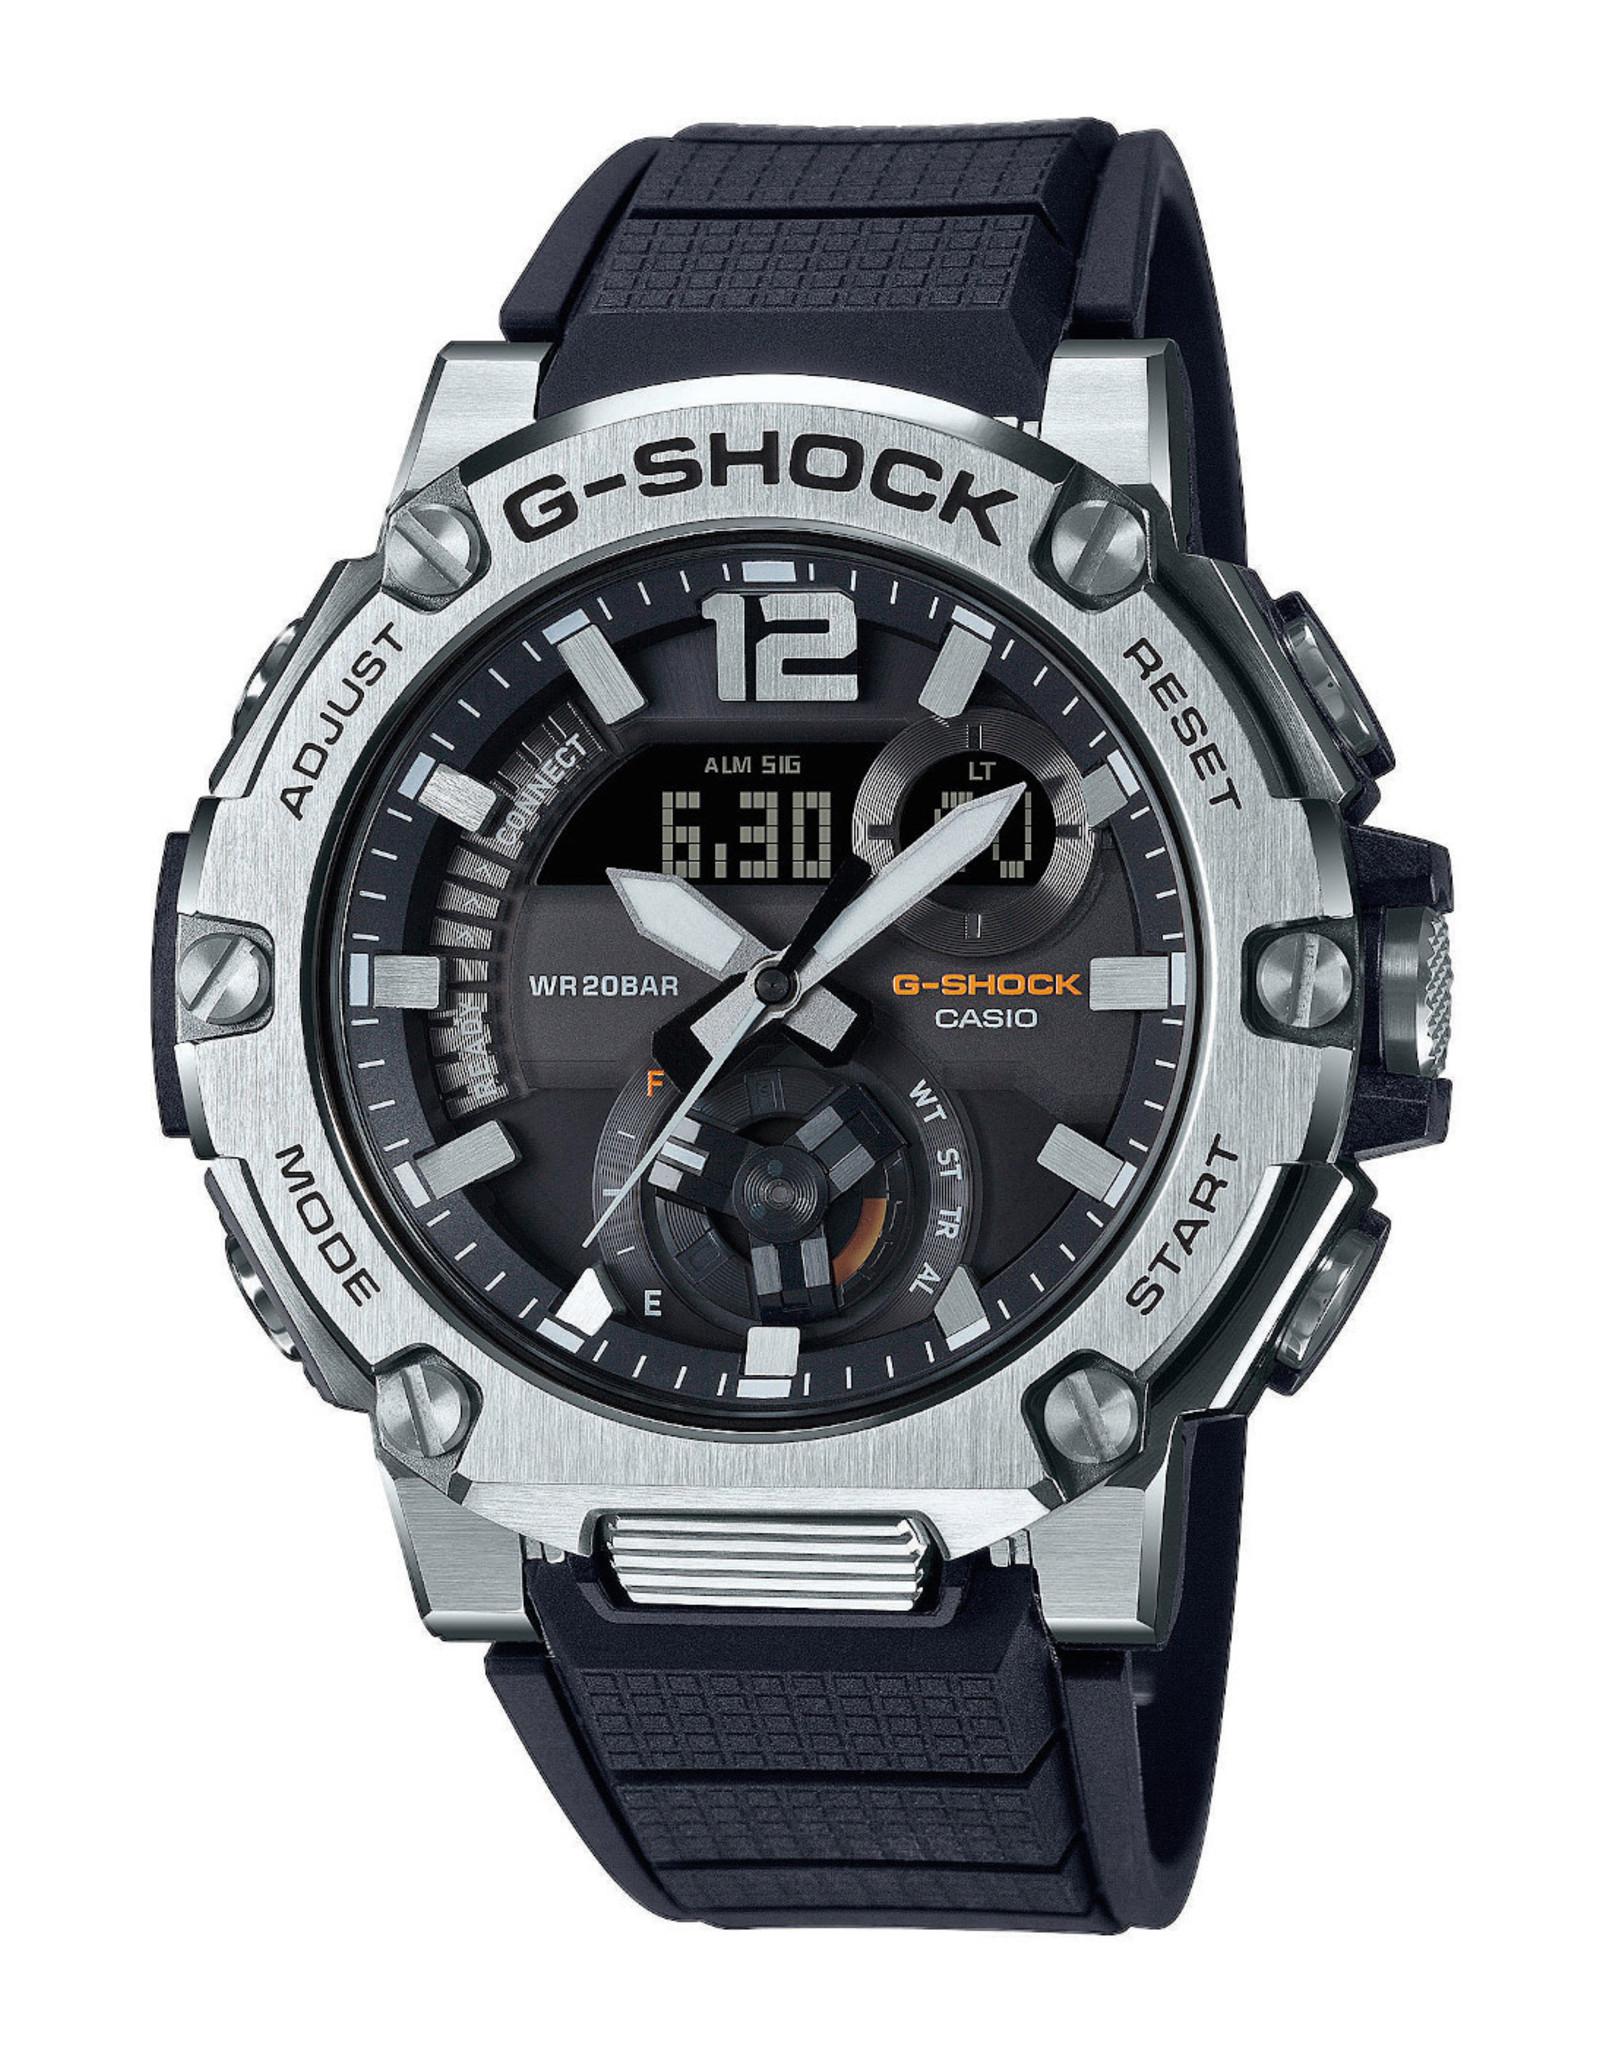 G - Shock gst-b300s-1aer